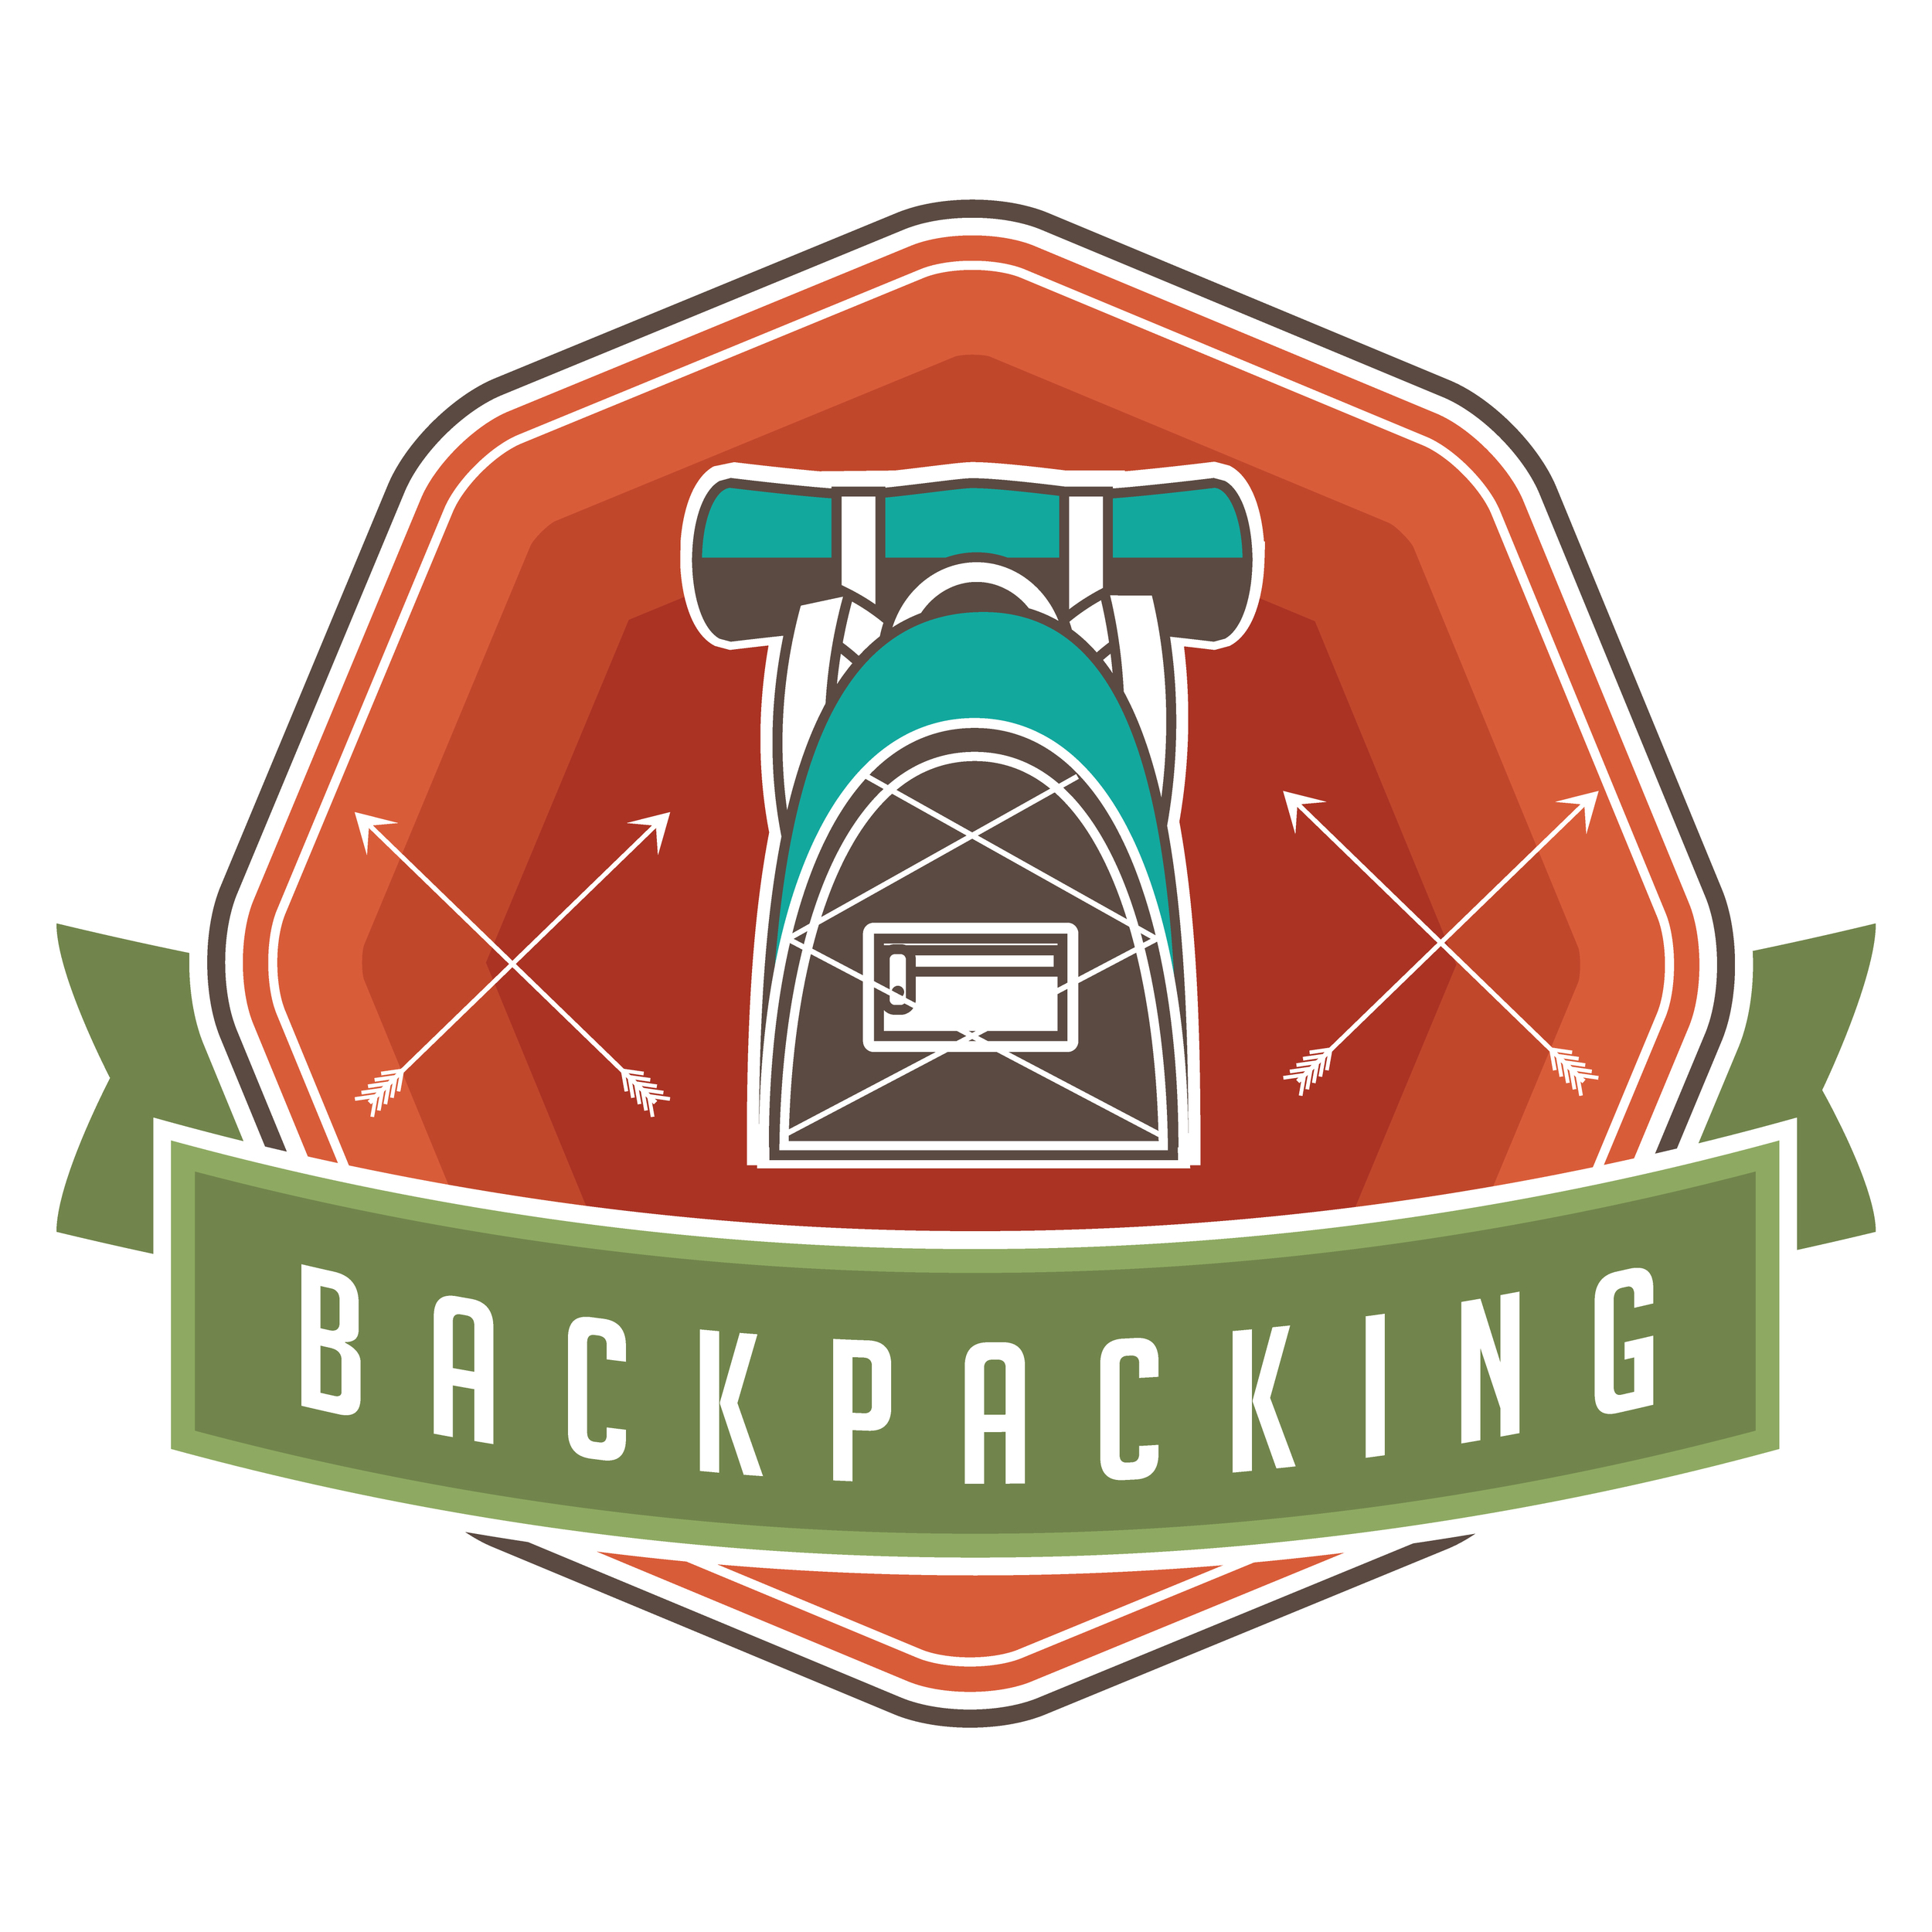 Backpacking_Badge_5_Sided.jpg